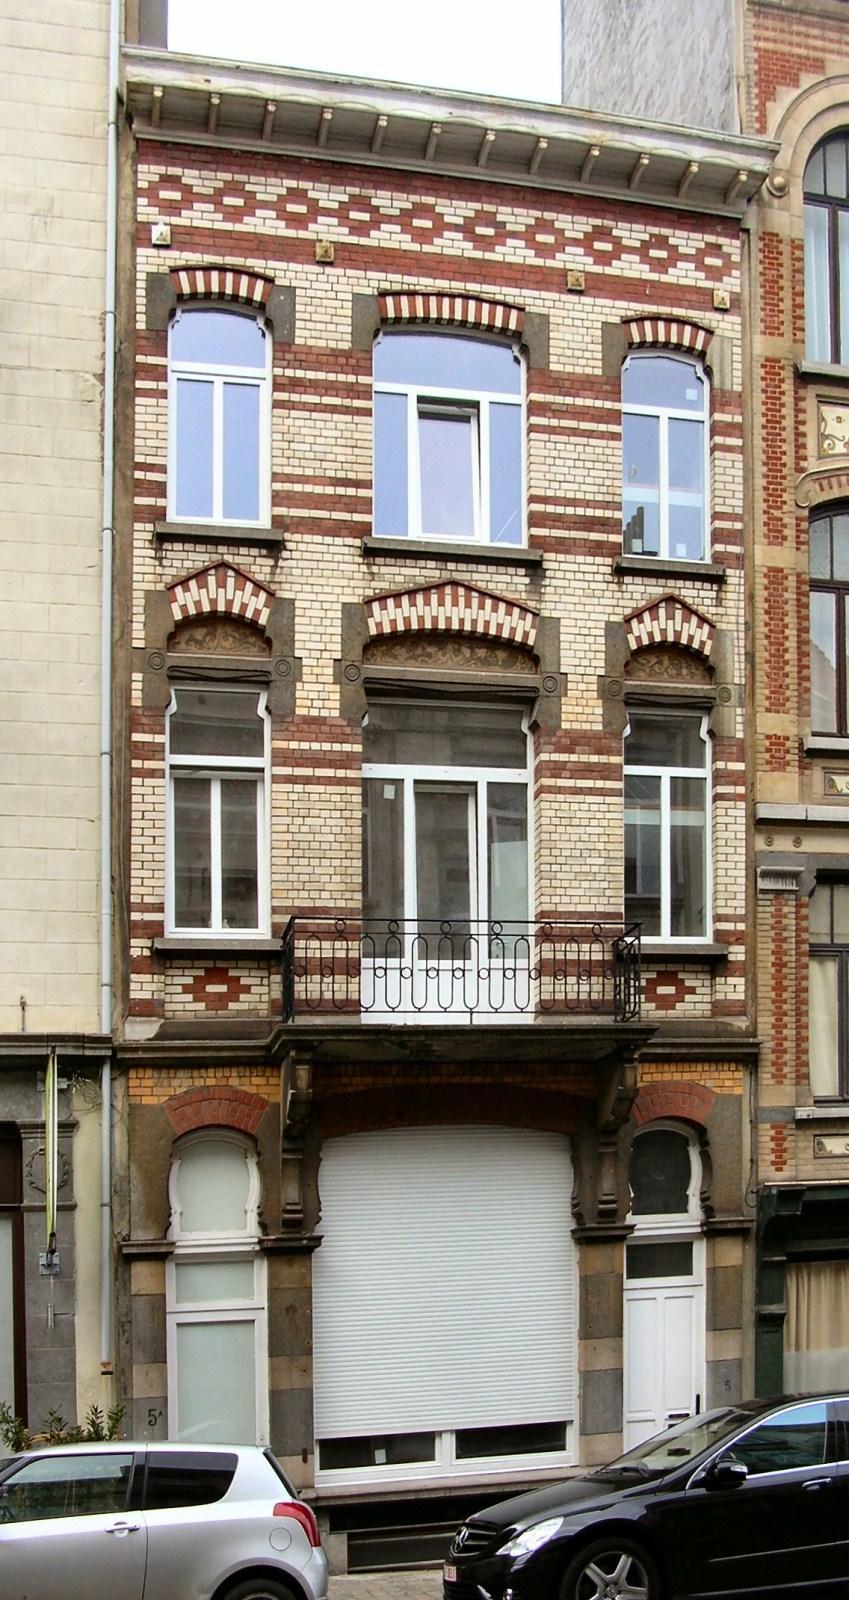 Dautzenbergstraat 5-5a., 2010